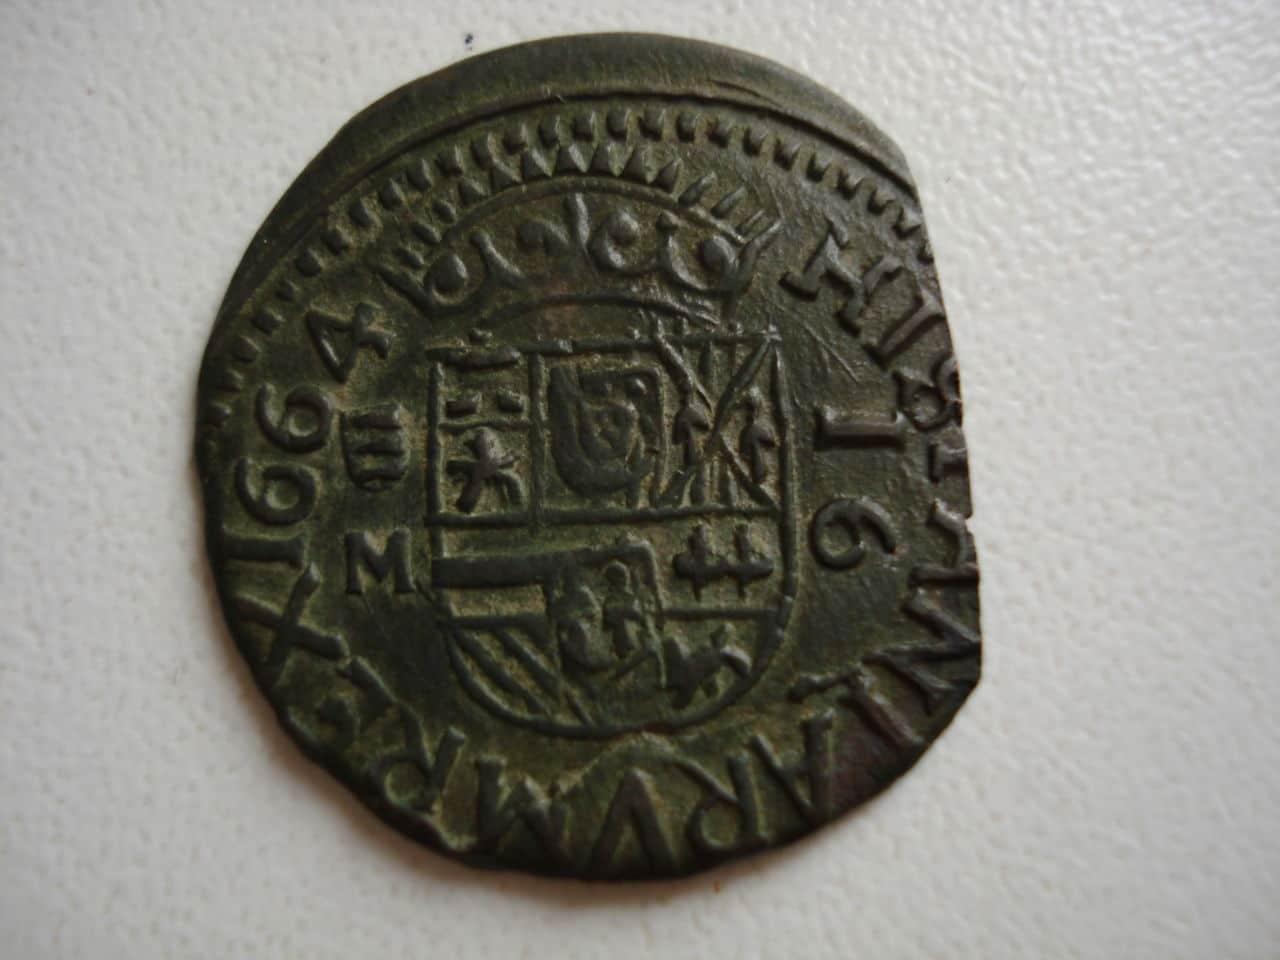 16 maravedís de Felipe IV, Valladolid, 1664. Monedas_018